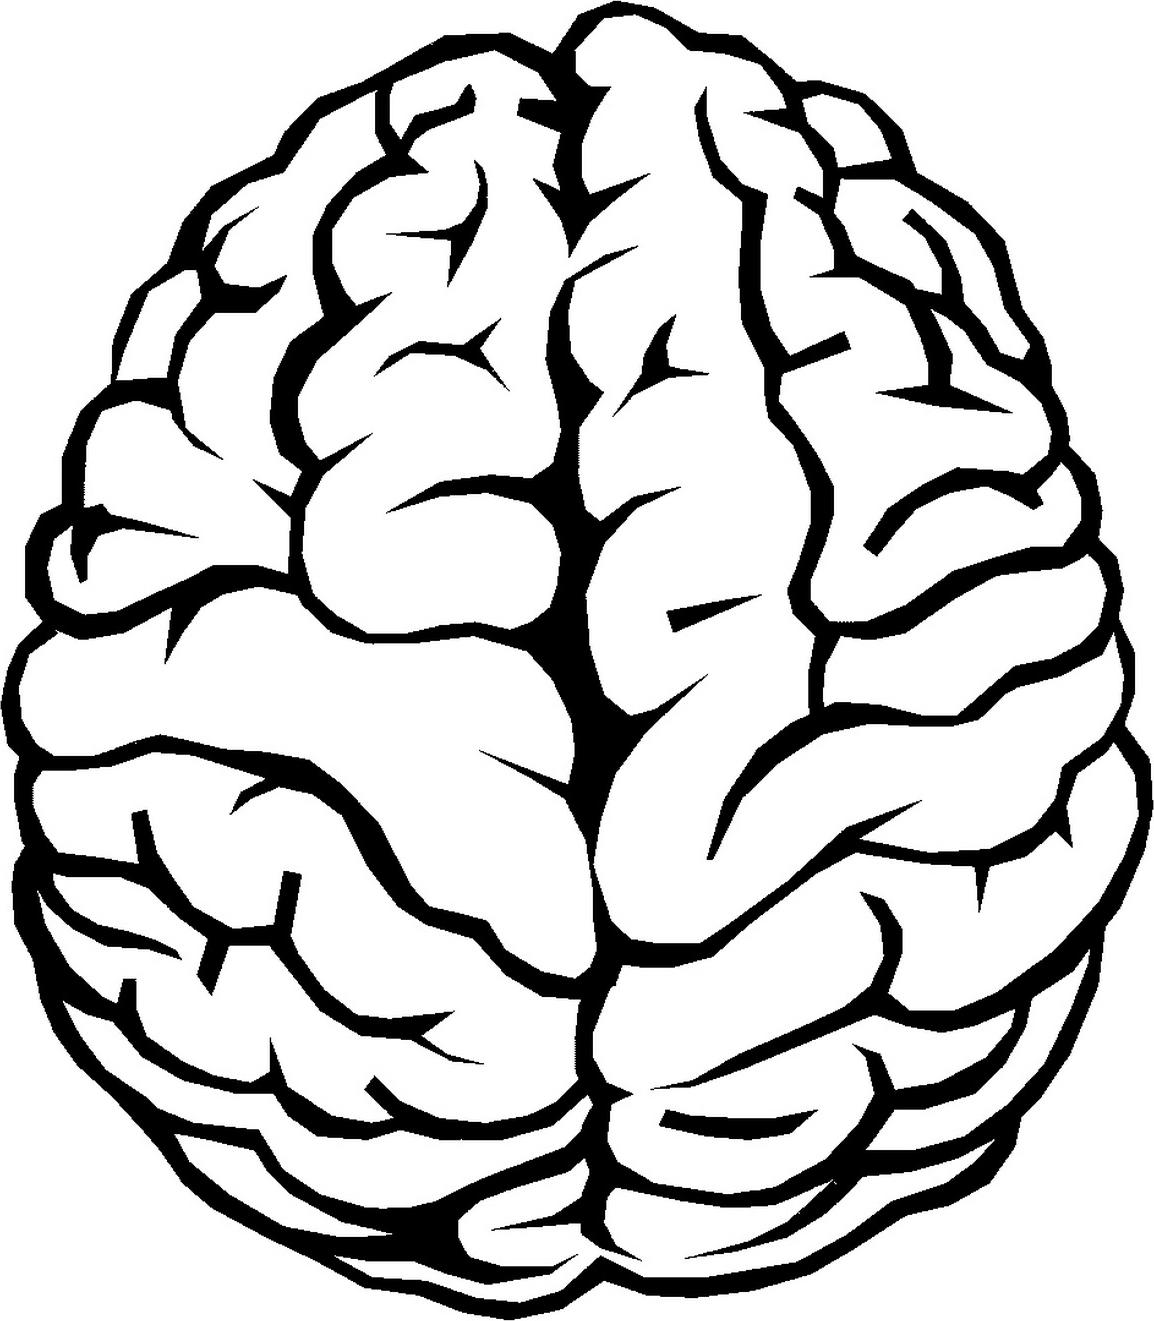 brain outline png image purepng free transparent cc0 png image